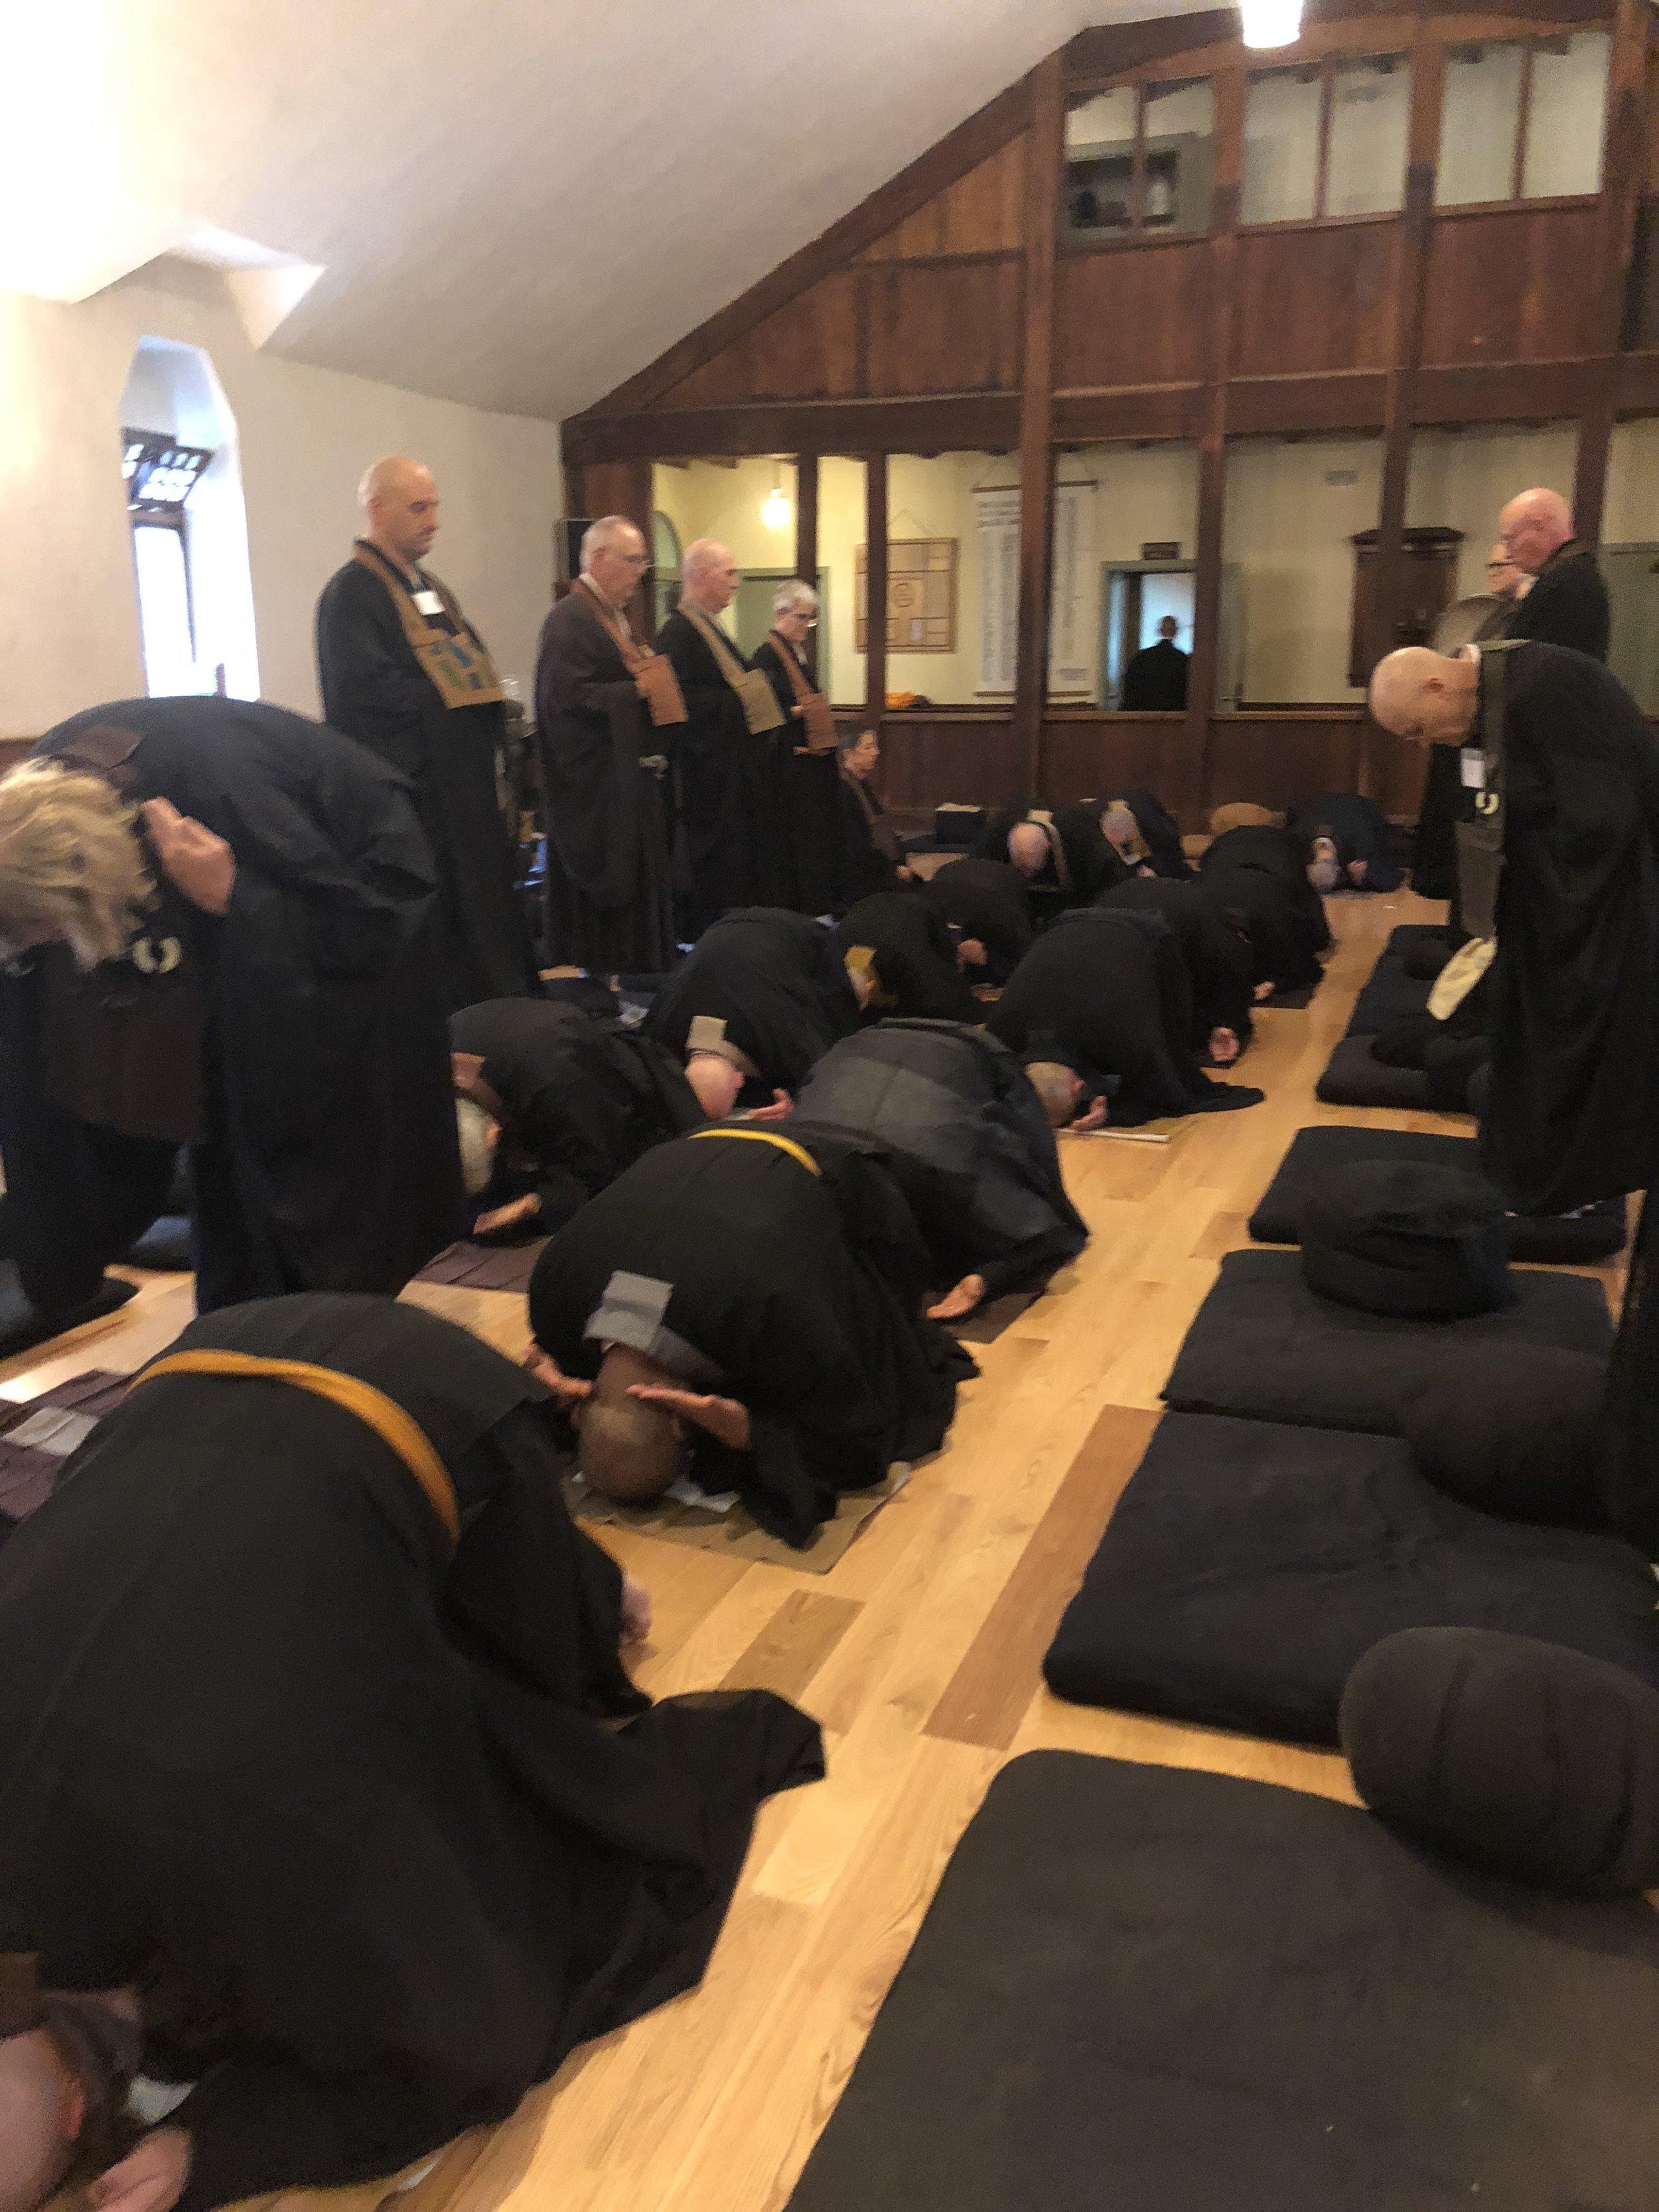 Zen Mountain Monastery - rehearsal for ceremony.